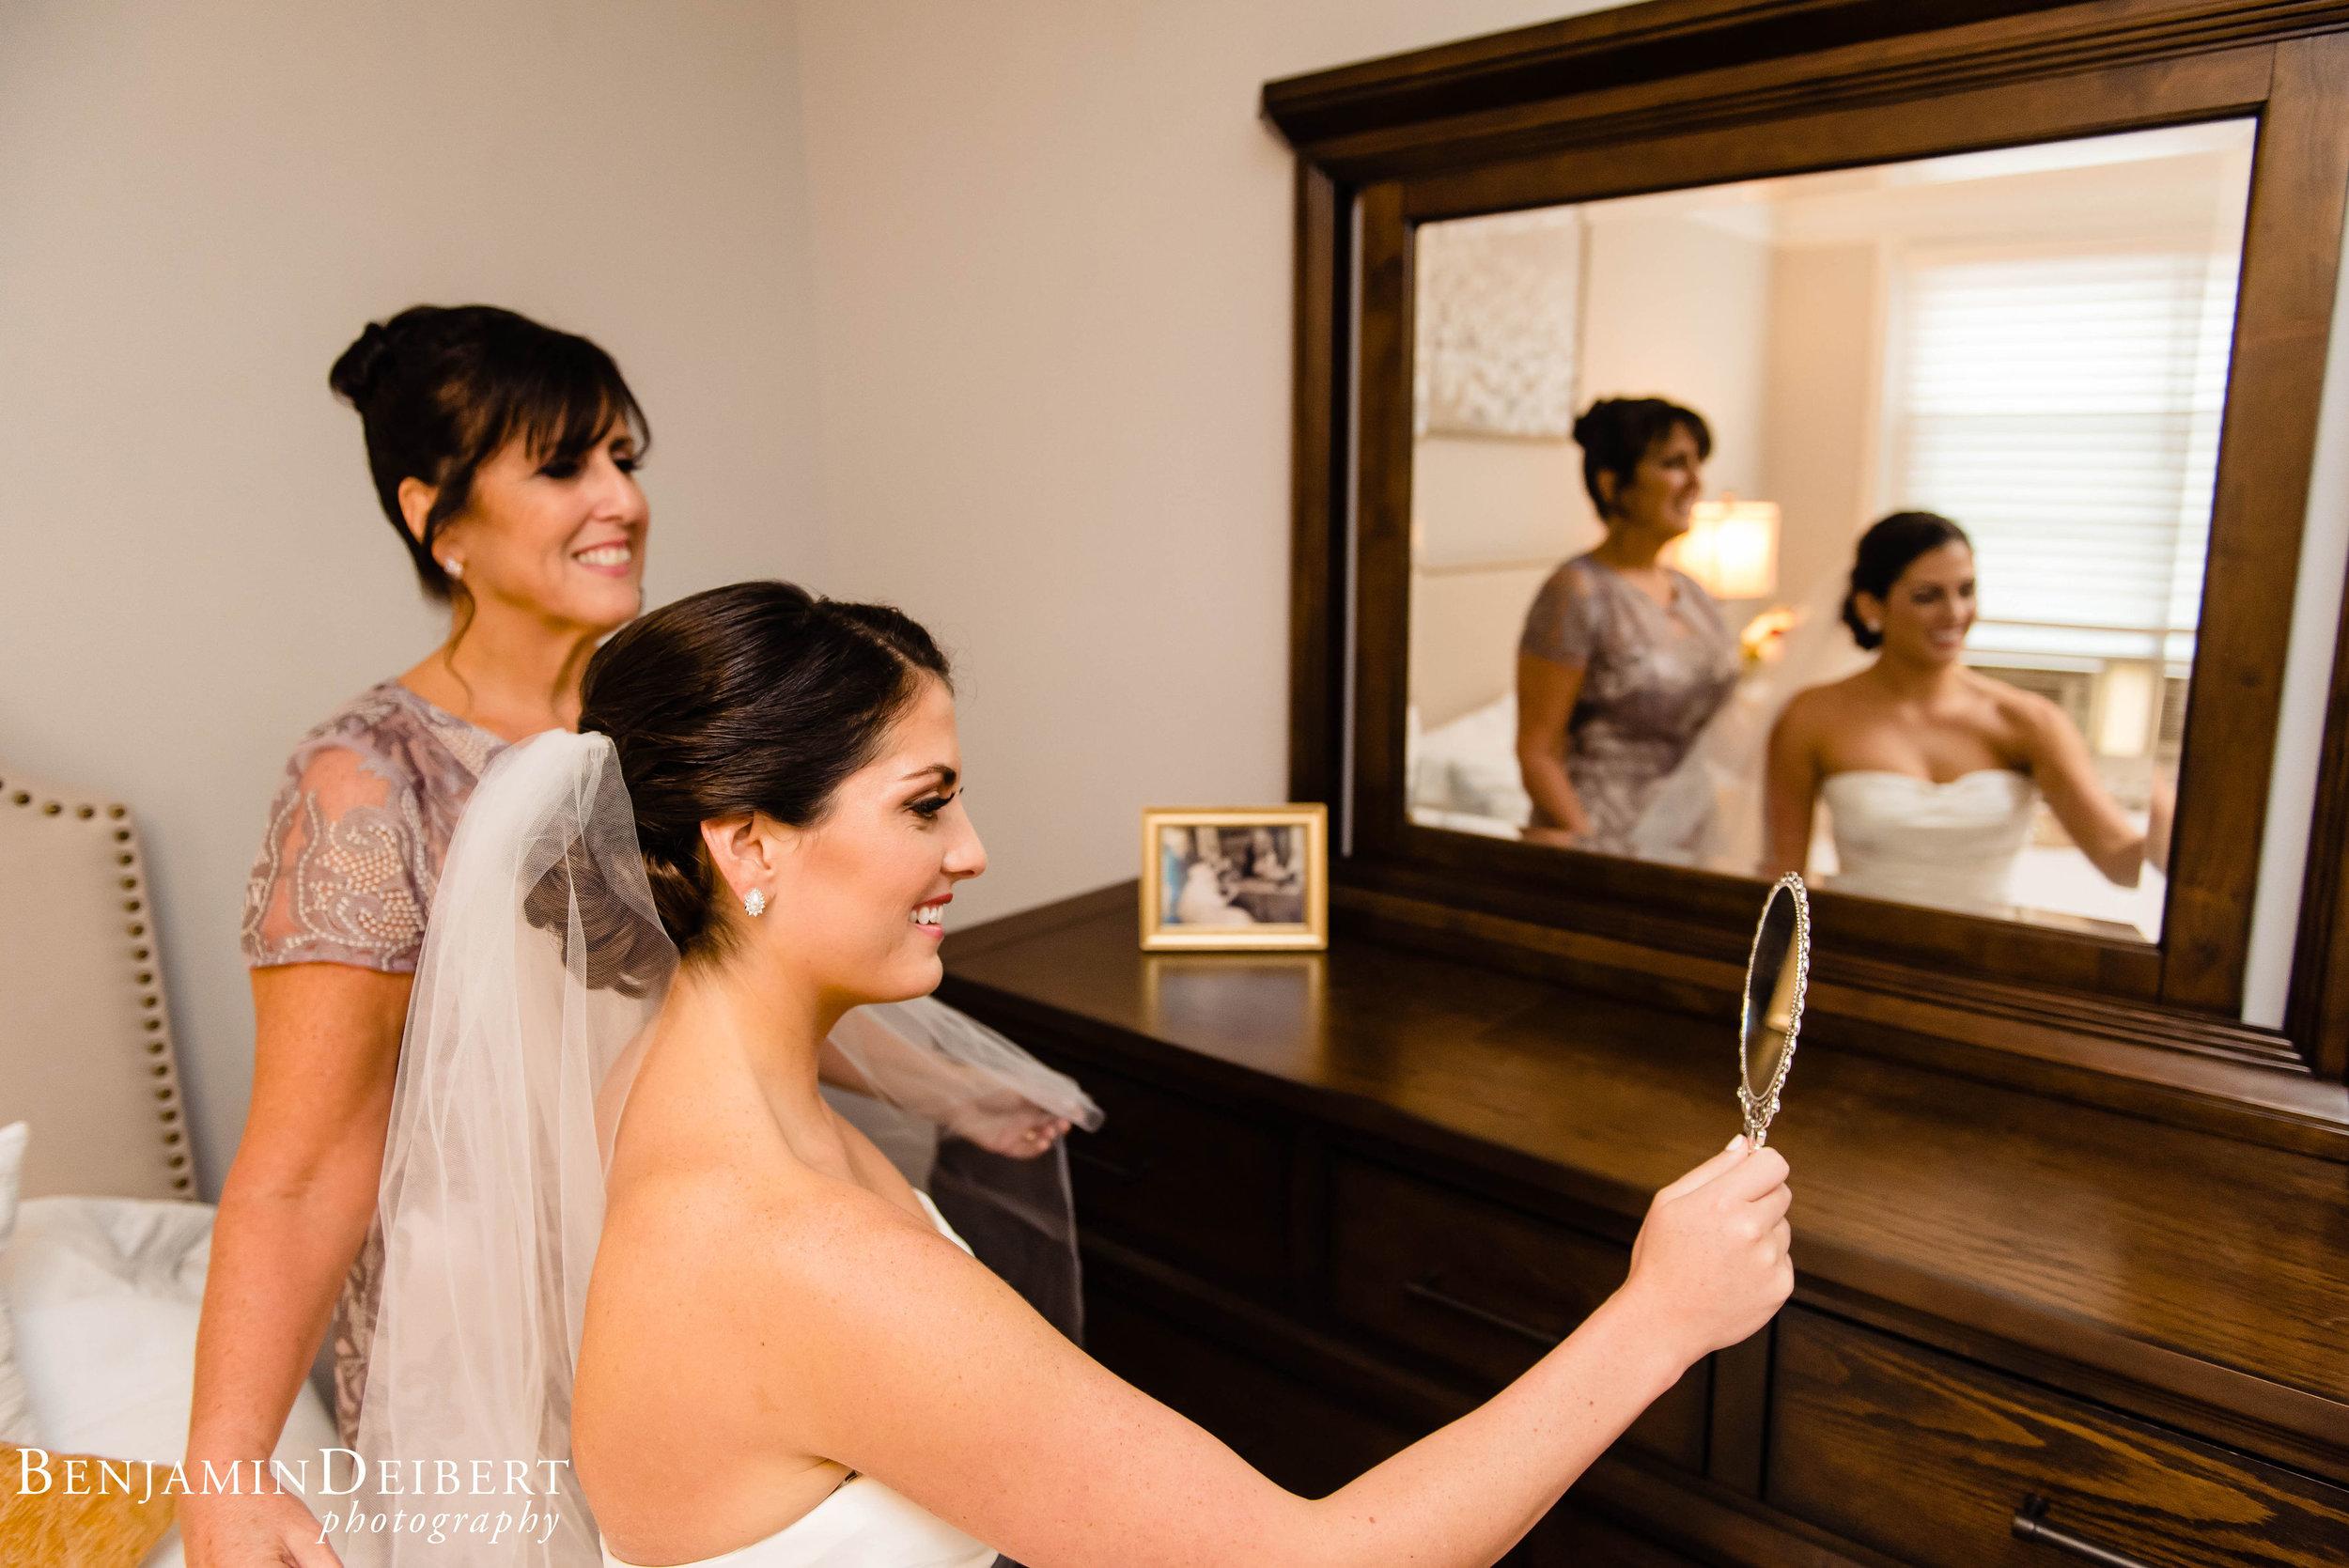 TeghanandChris_BridgemensBallroom_Wedding-35.jpg